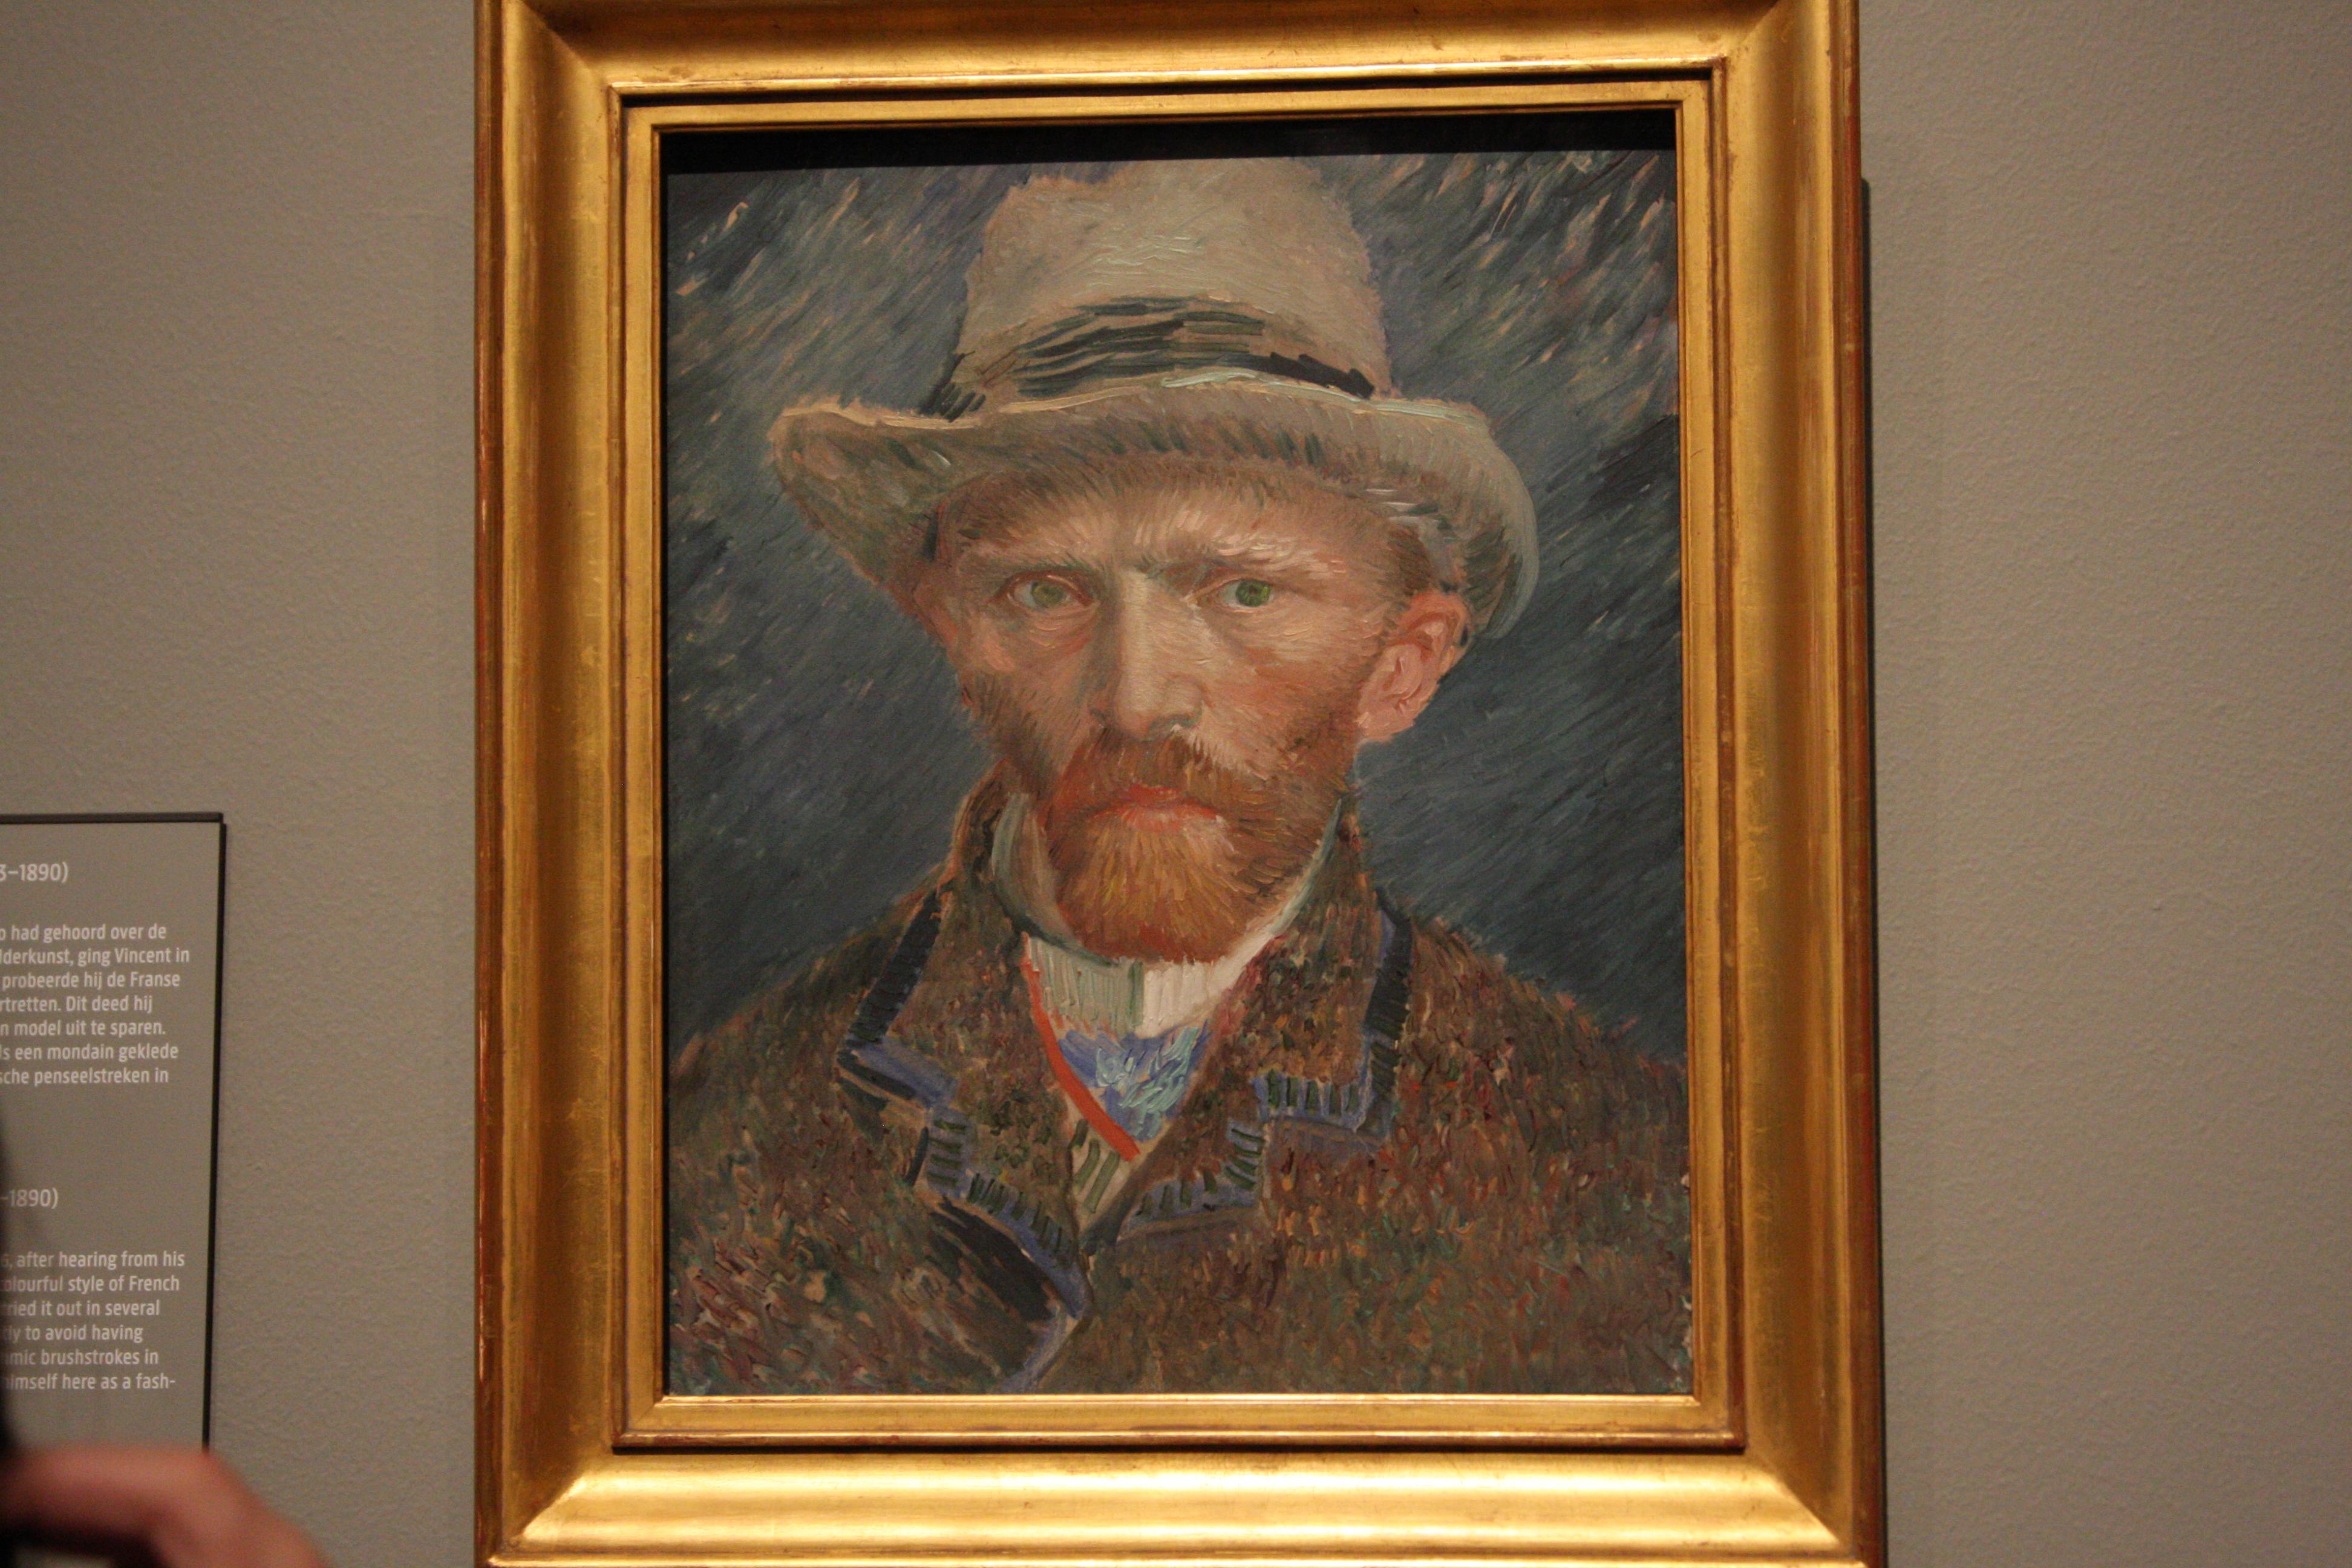 Van Gogh self portrait in the Rijksmuseum in Amsterdam